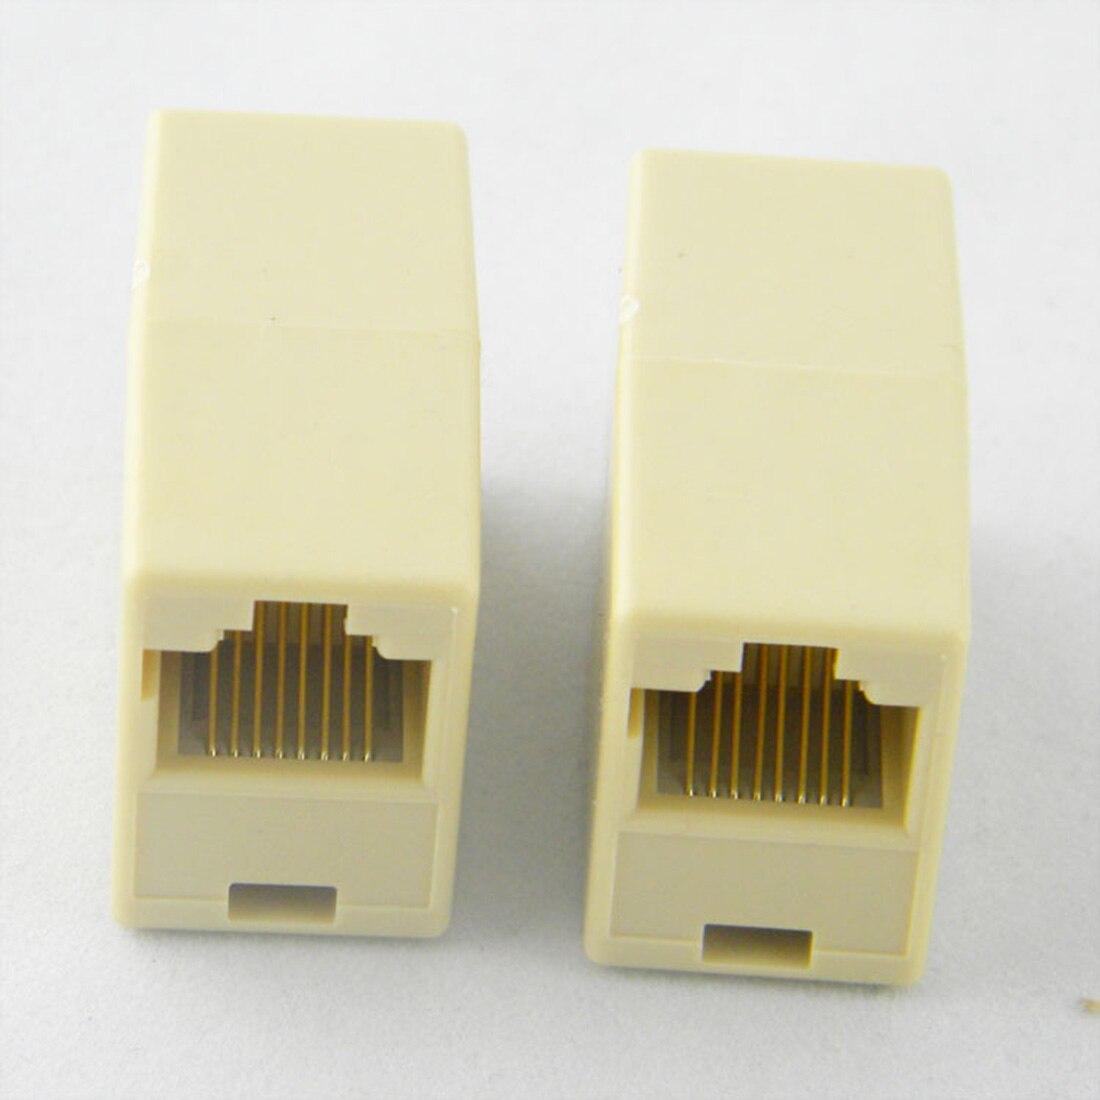 Marsnaska Cable Joiner RJ45 Adapter Network Ethernet Lan Coupler Connector Extender Plug usb 2 0 to rj45 lan ethernet network adapter